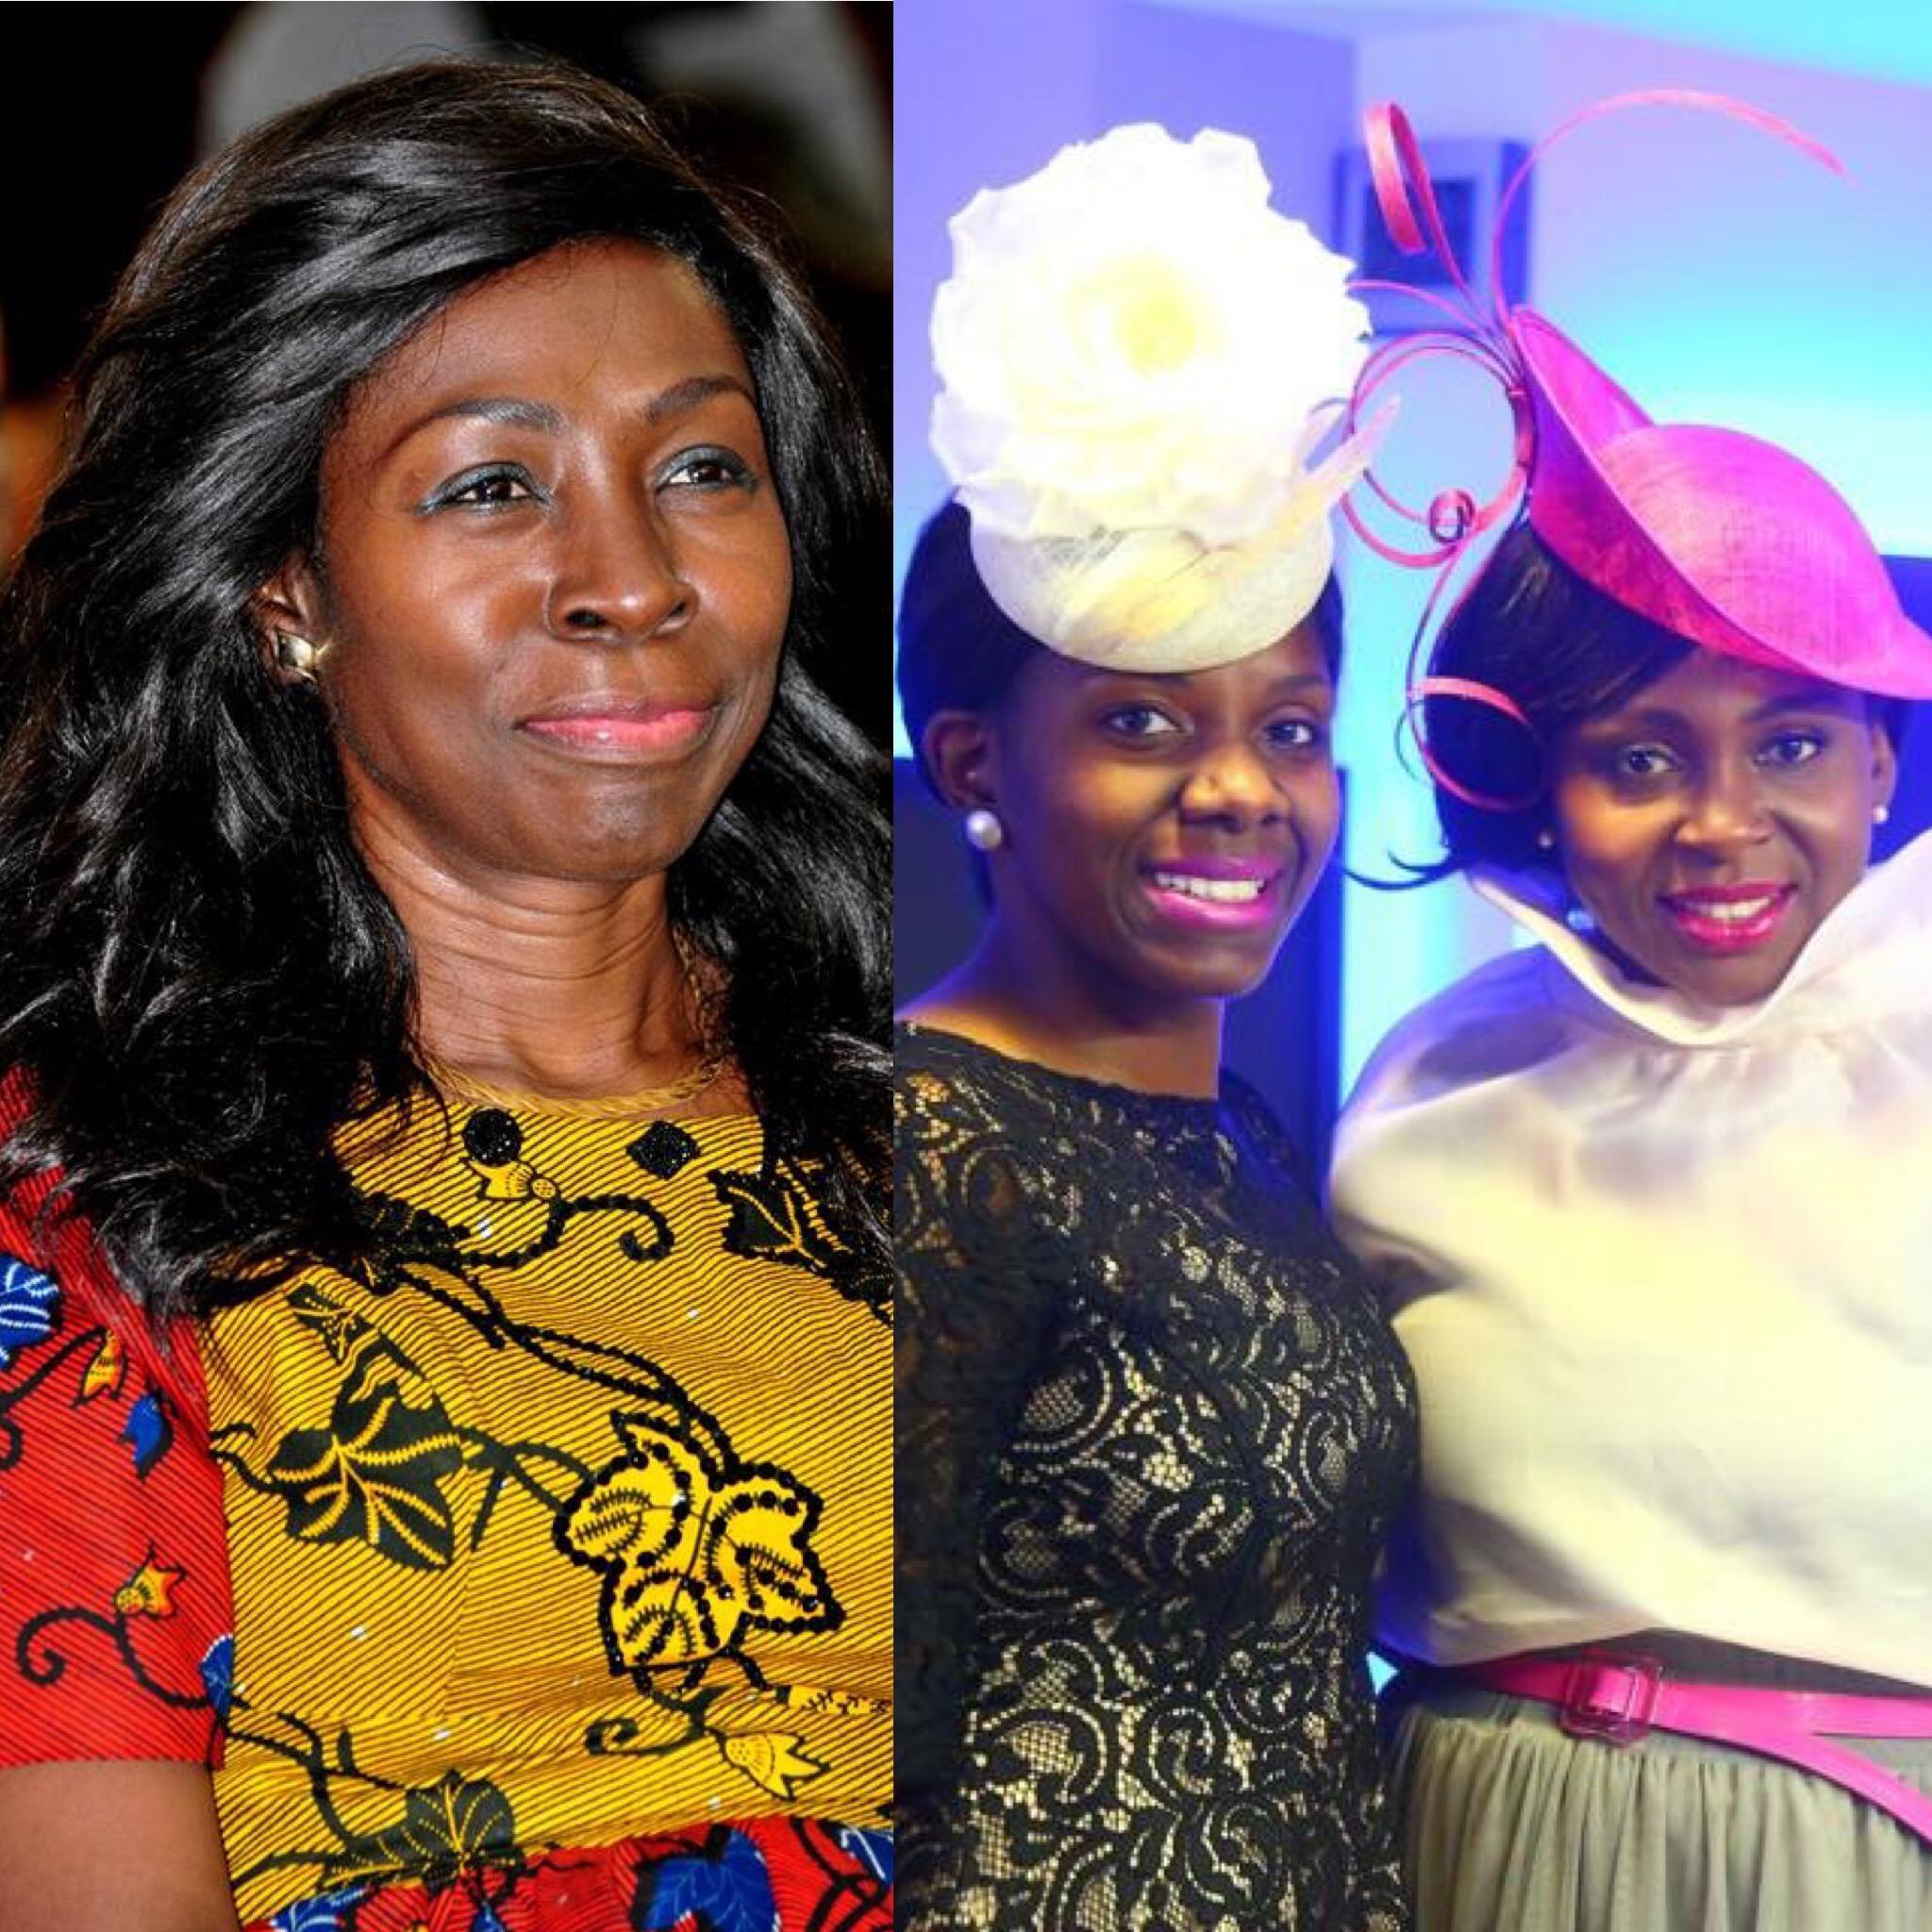 From left to right: Rev. (Mrs) Adelaide Heward-Mills, Mrs. Kemi Oyedepo & Rev. (Mrs) Awo Antwi